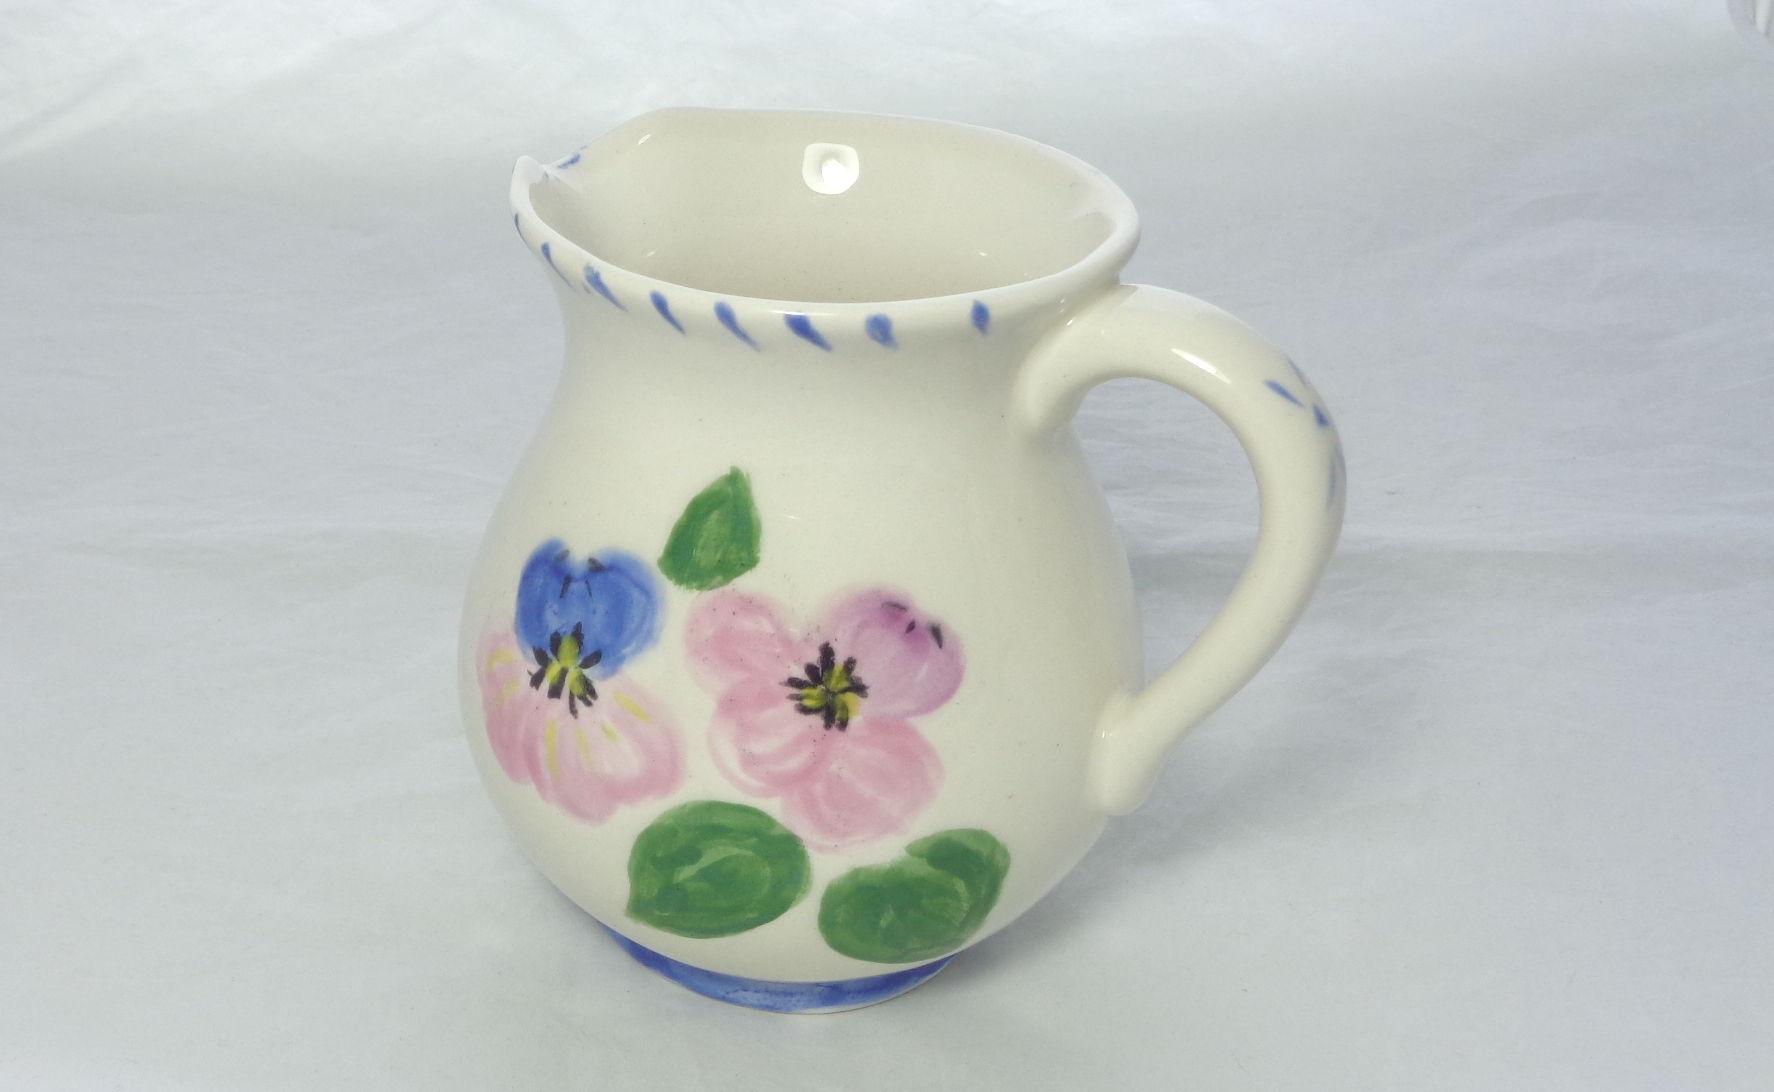 Bemalte Keramik Krug 0.5l Veillchen